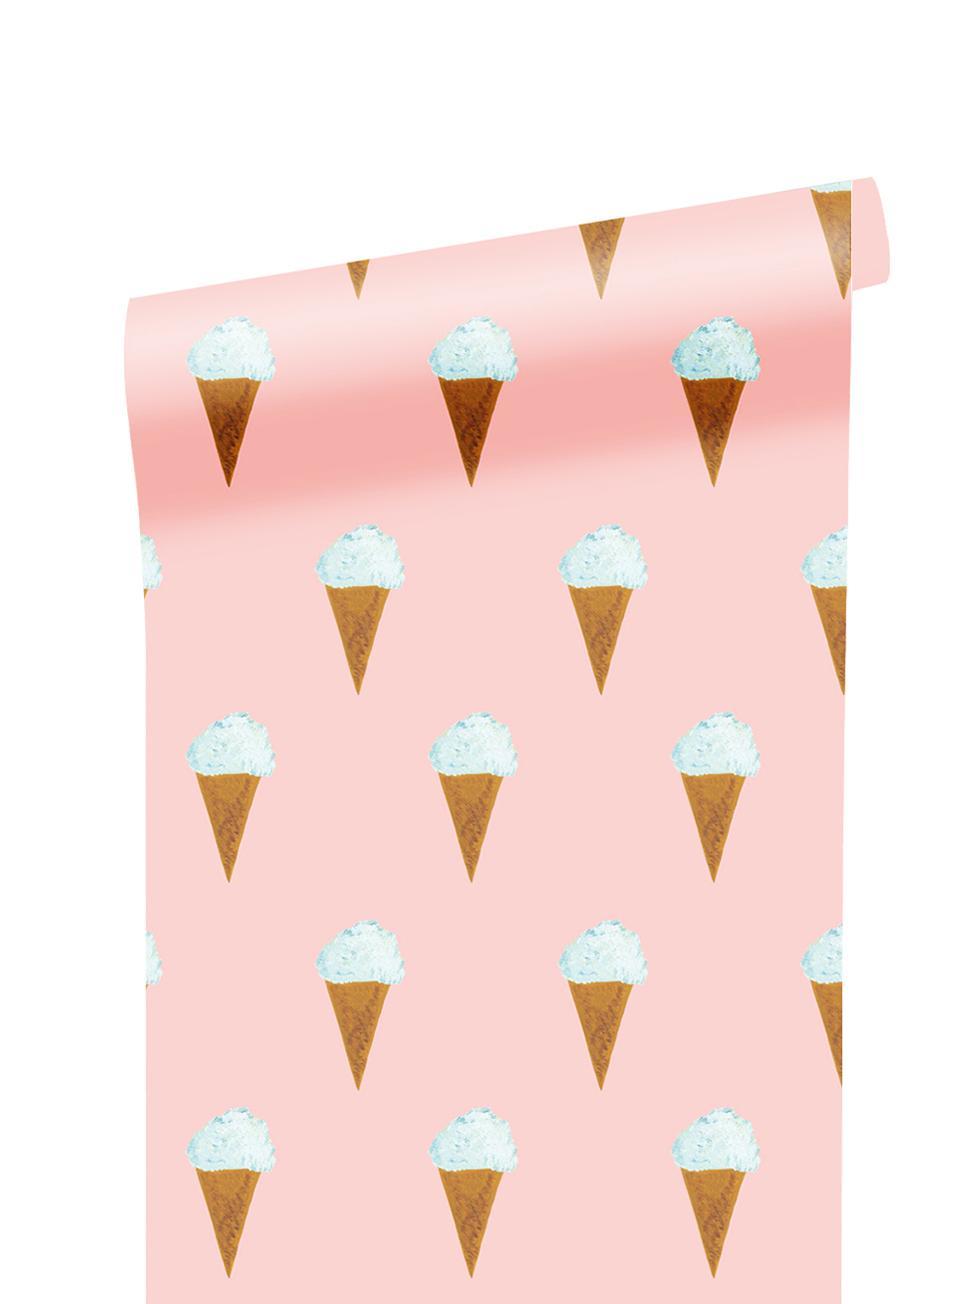 Tapete Ice cream, Papier, matt, 165 g/m², Rosa, Weiss, Braun, B 97 x H 280